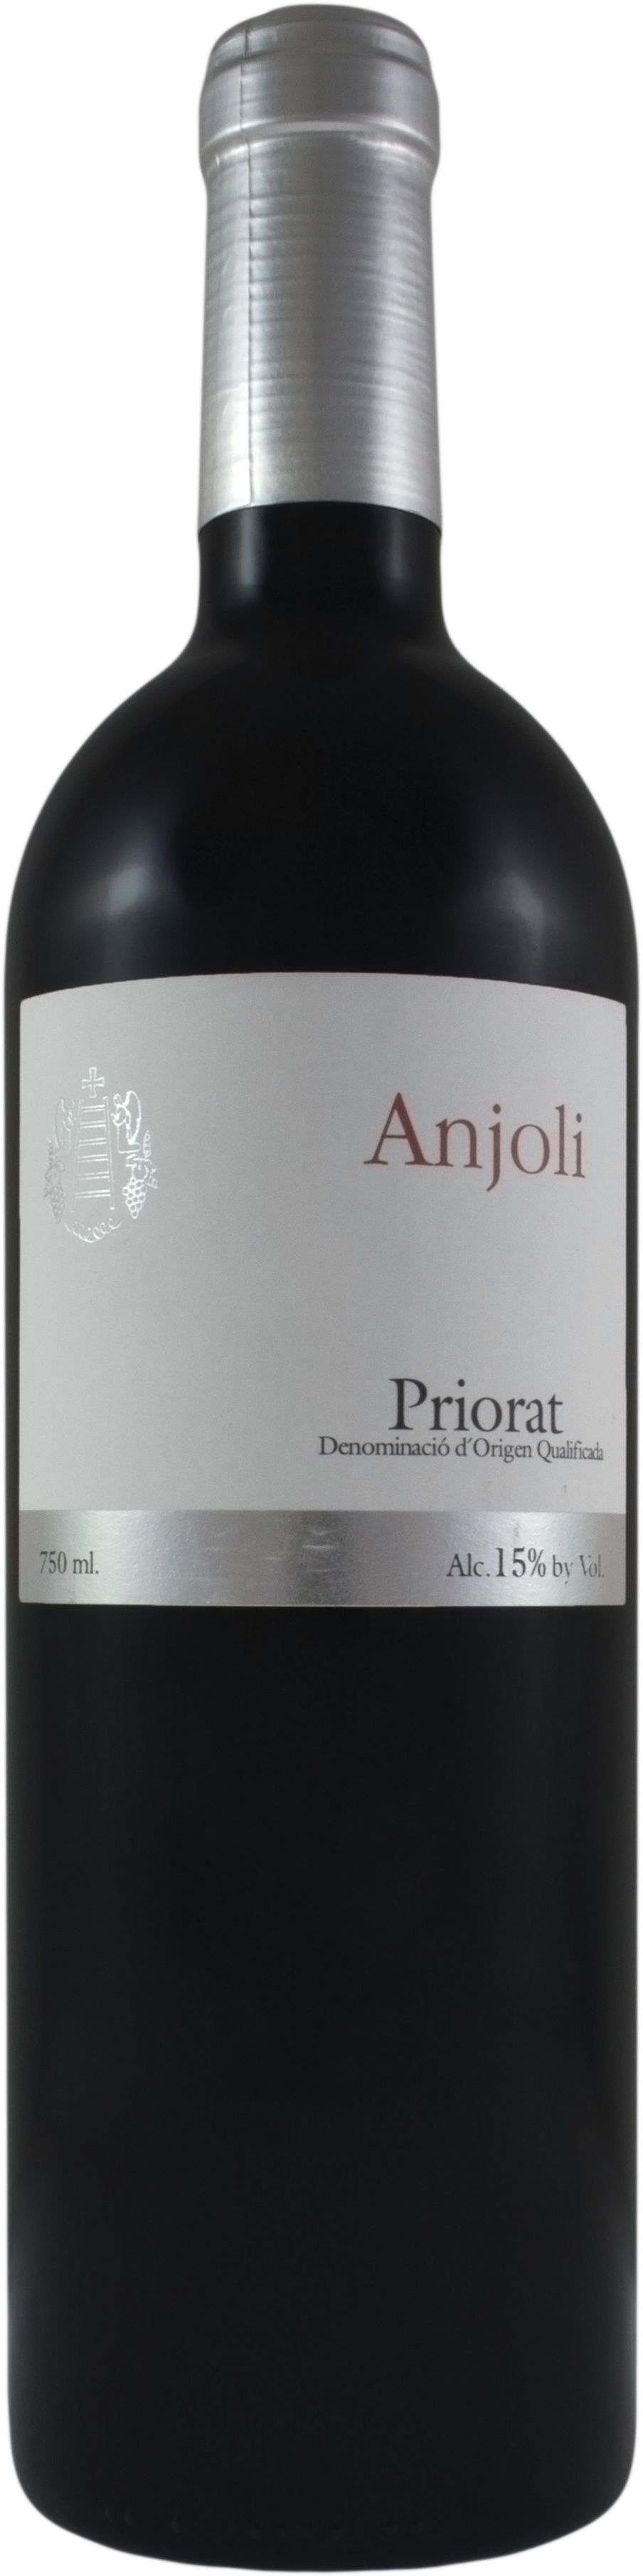 Anjoli Priorat